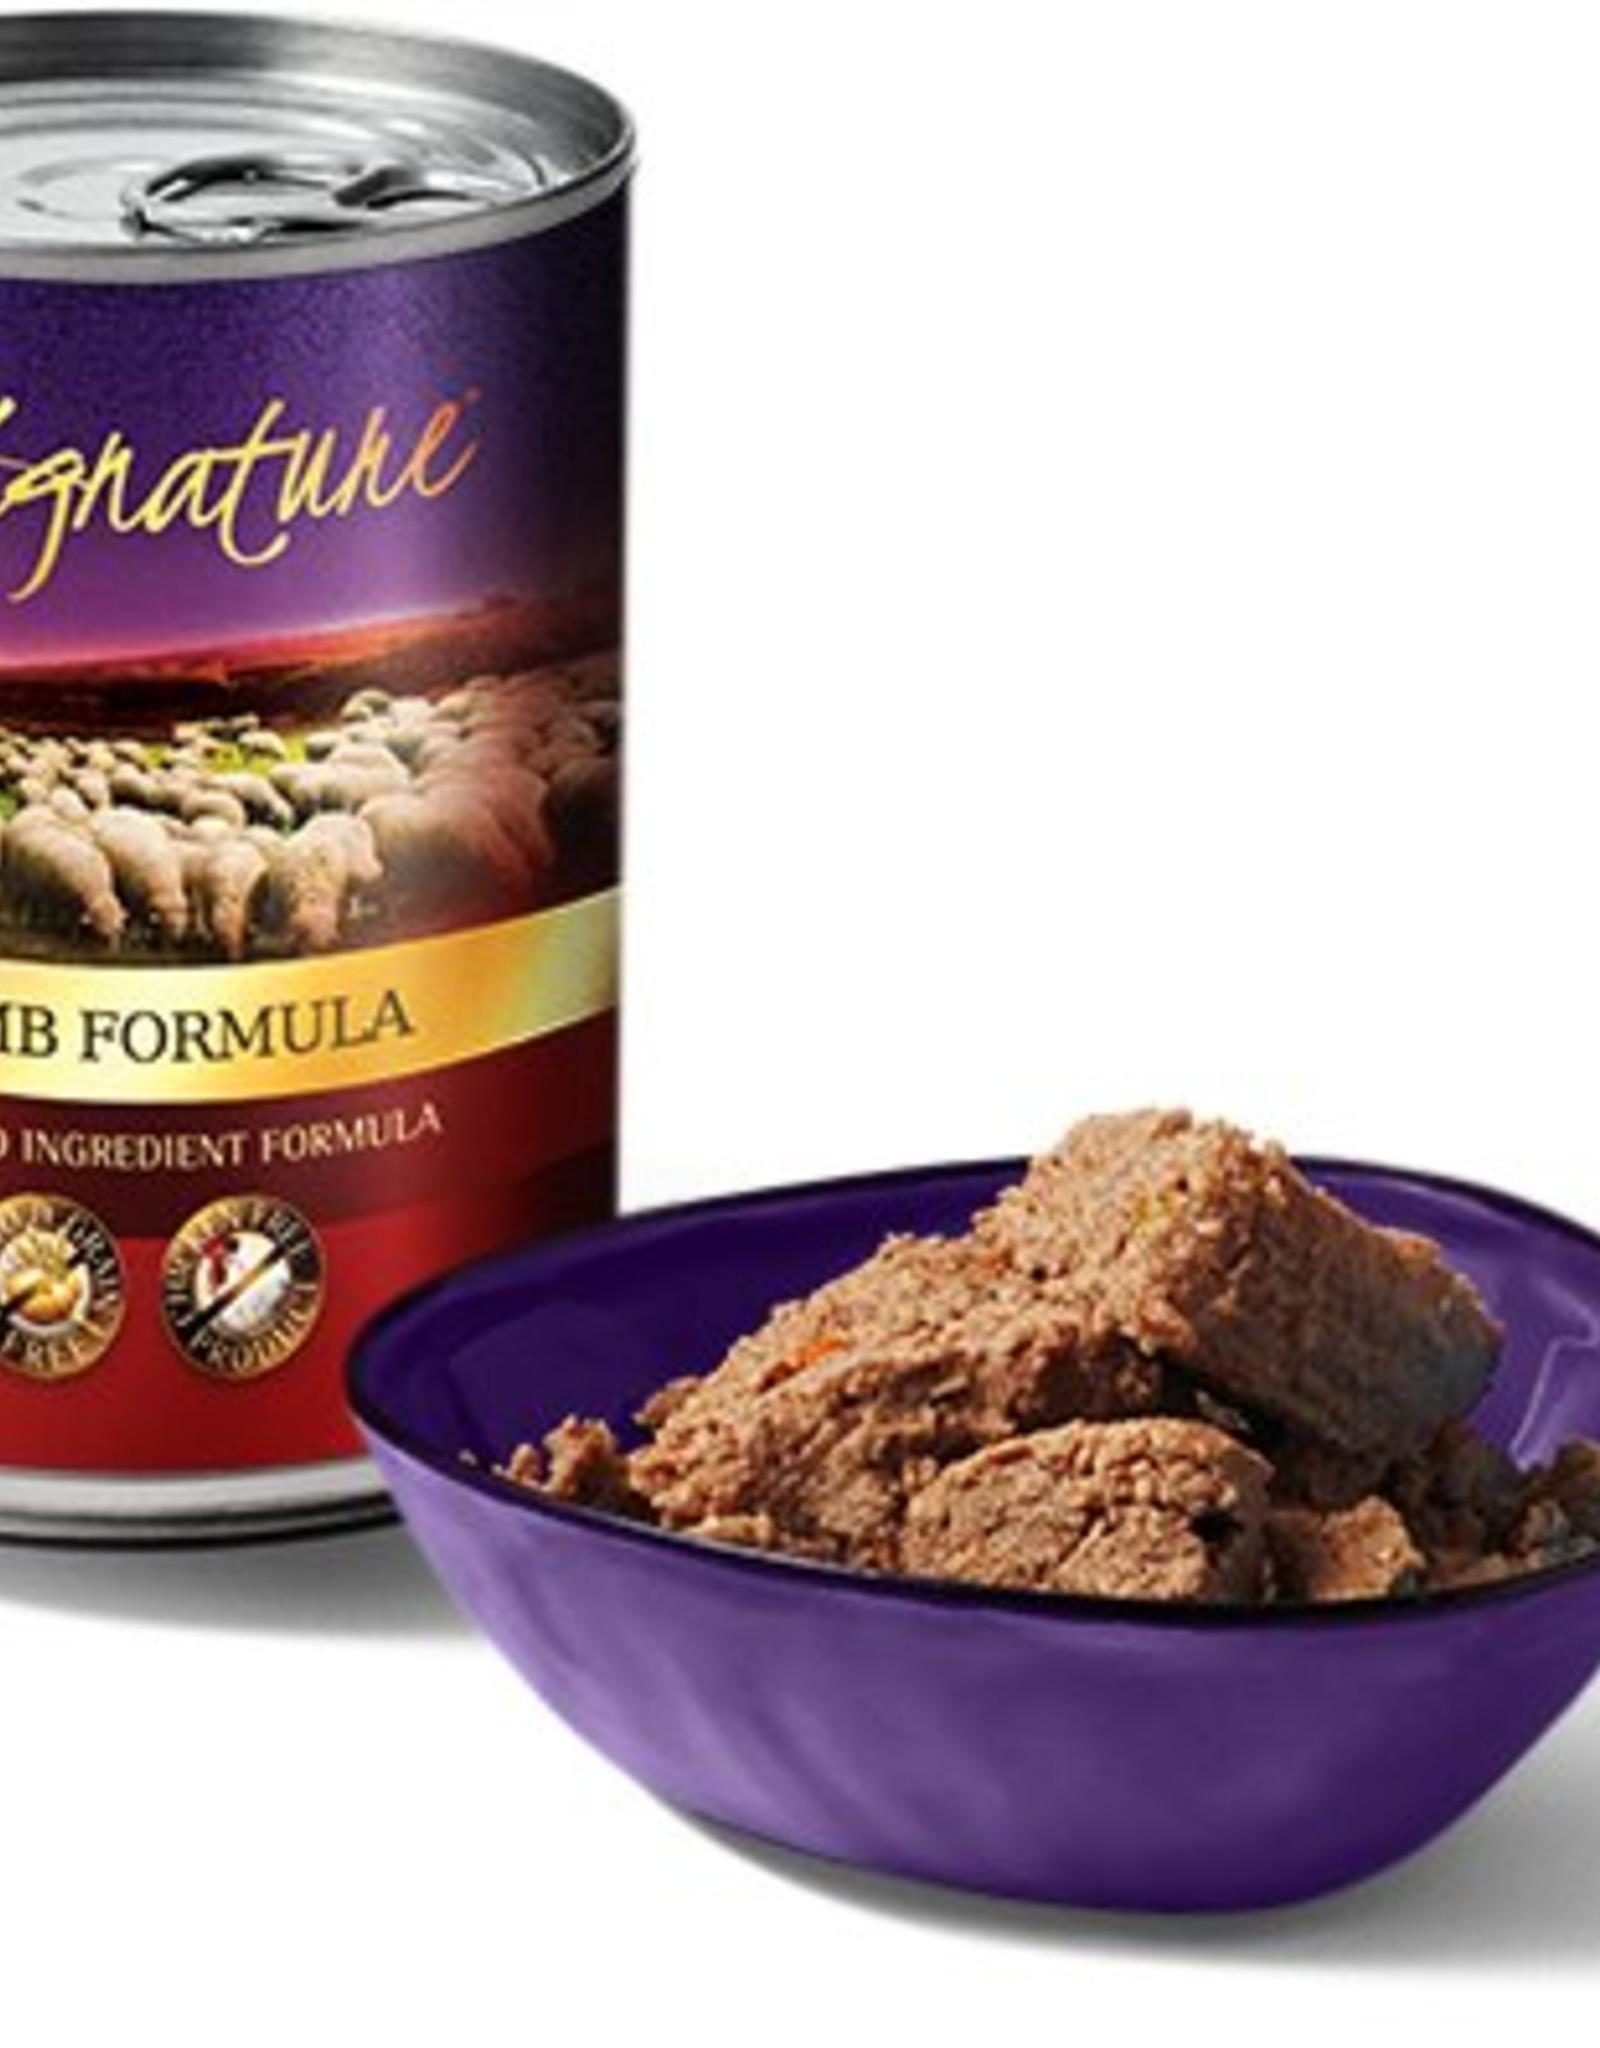 Zignature Lamb Limited Ingredient Formula Grain-Free Wet Dog Food, 13 oz.